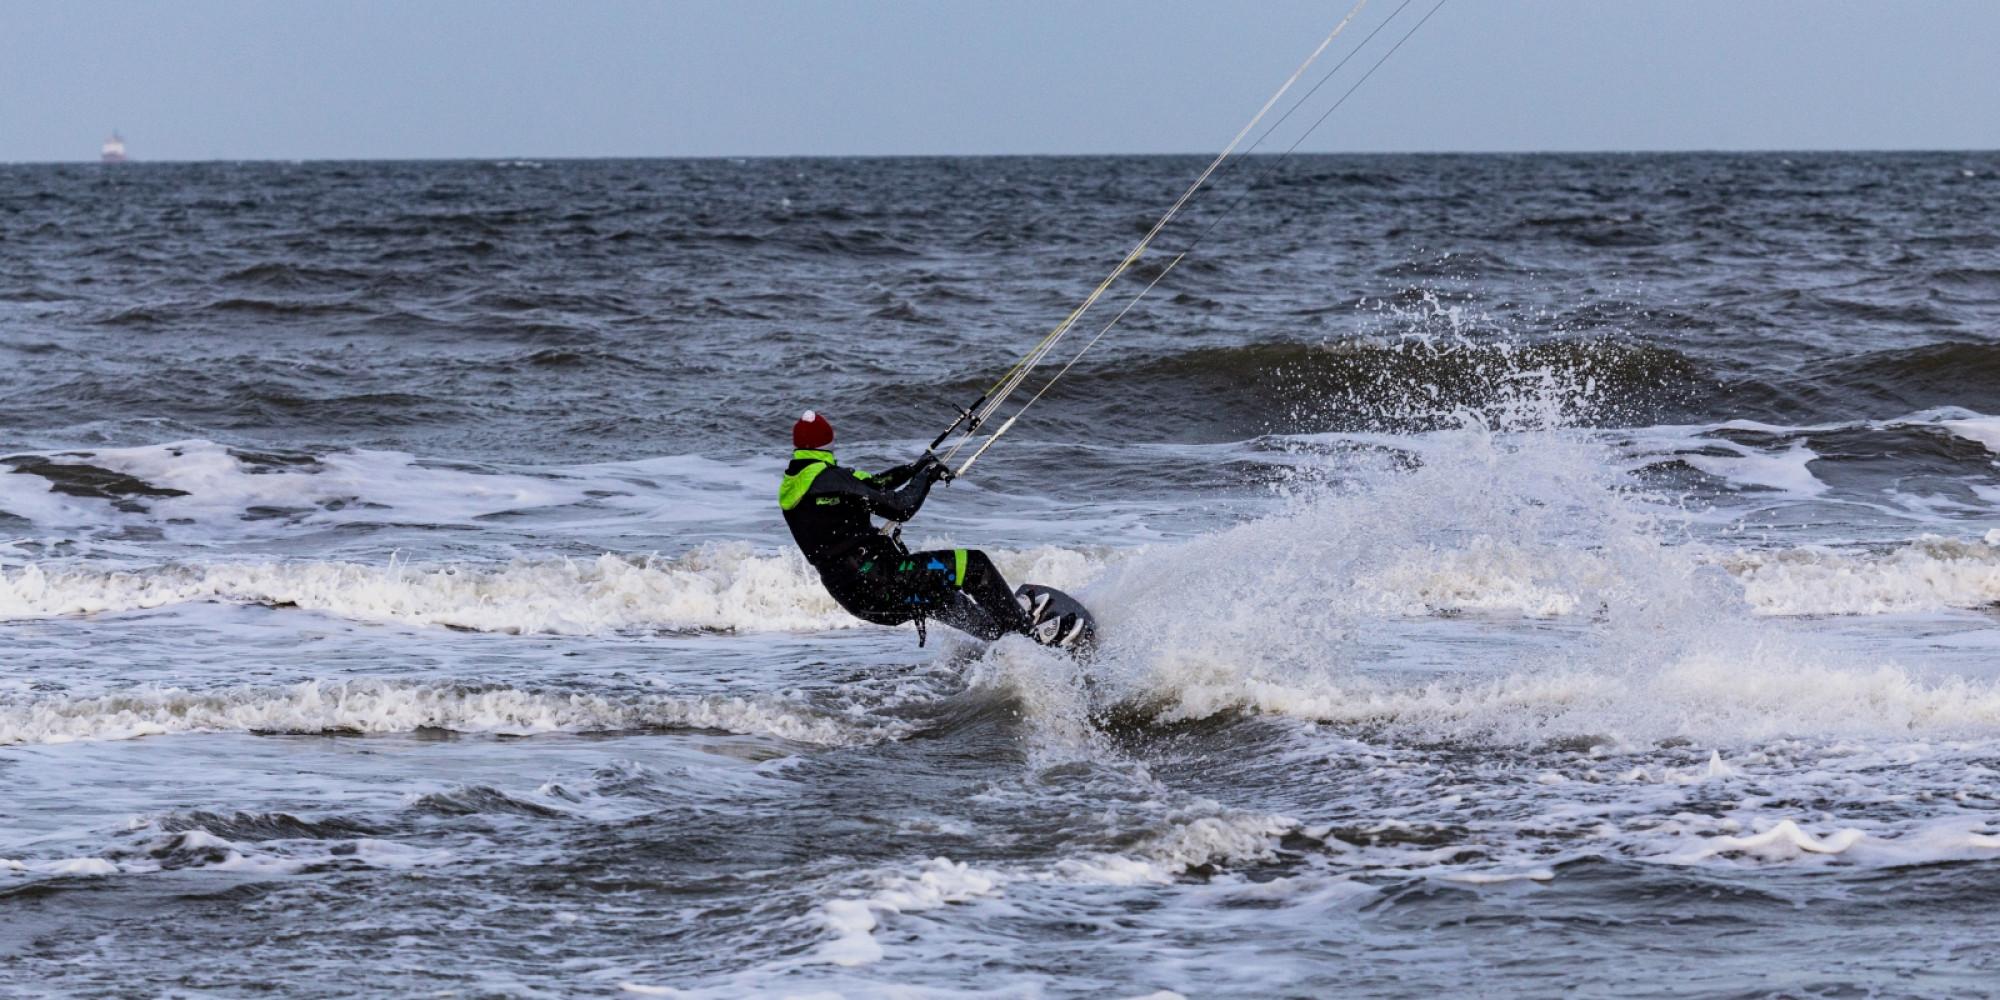 Kitesurfer stock